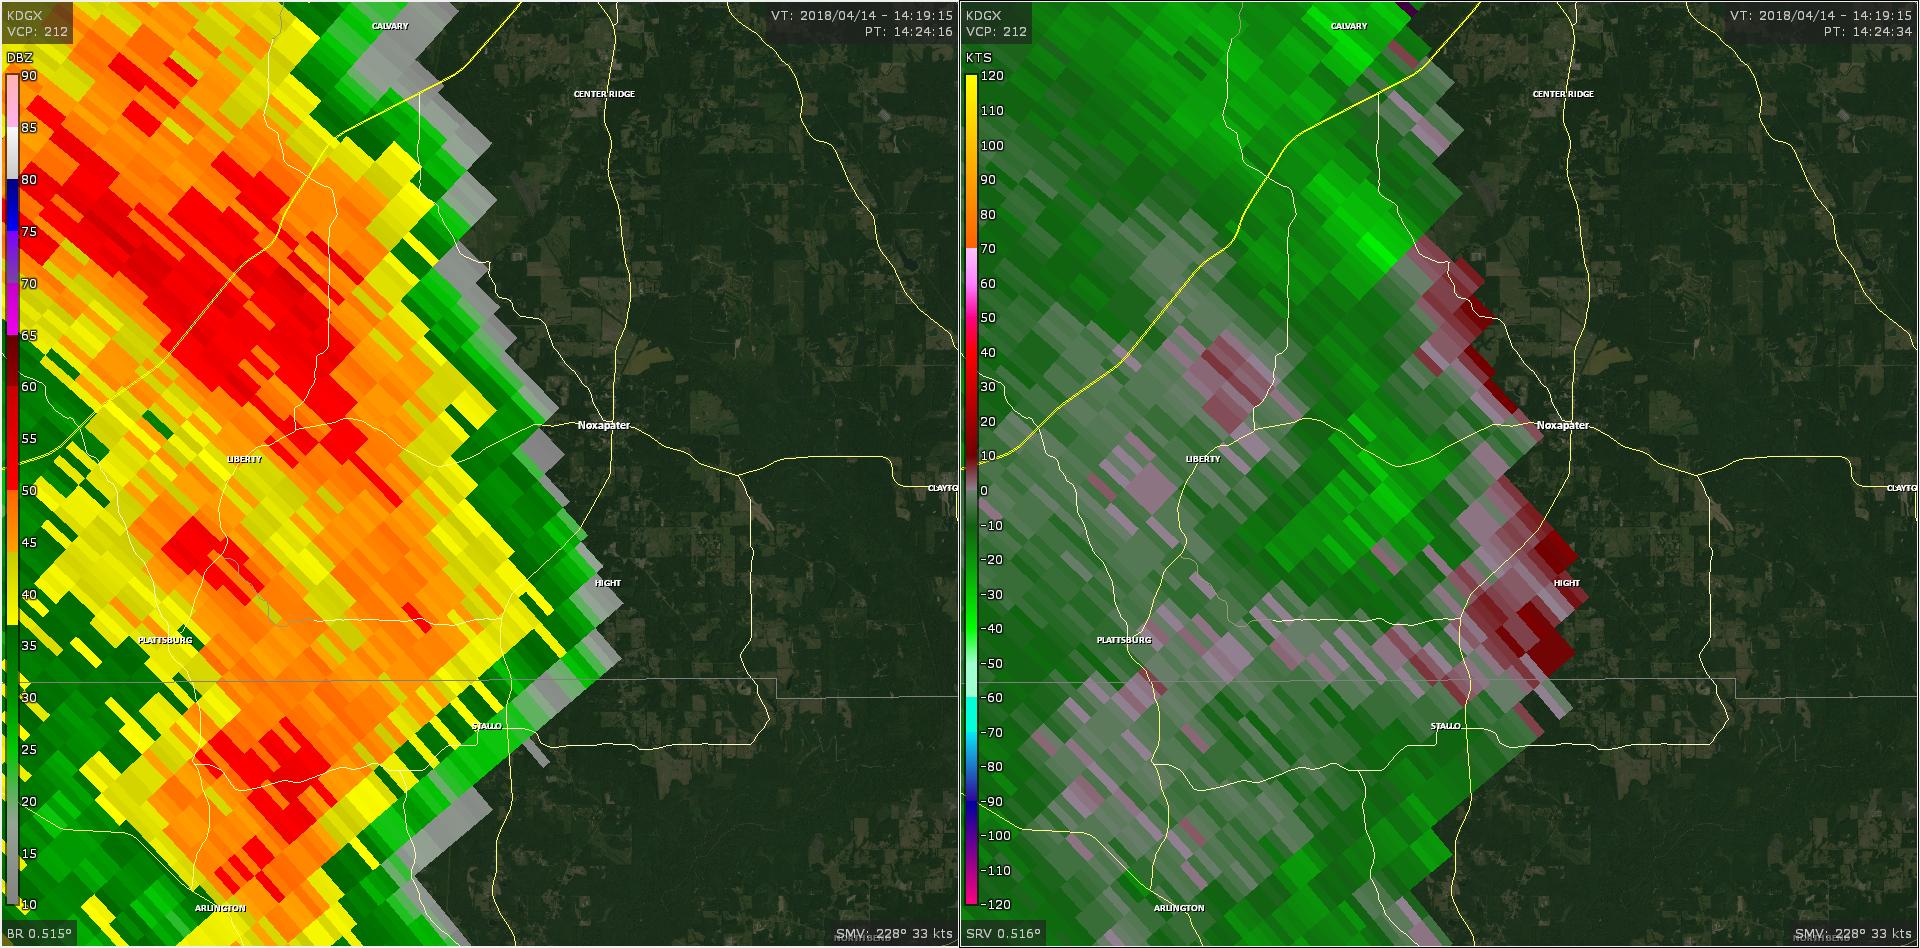 Radar - Winston County Tornado